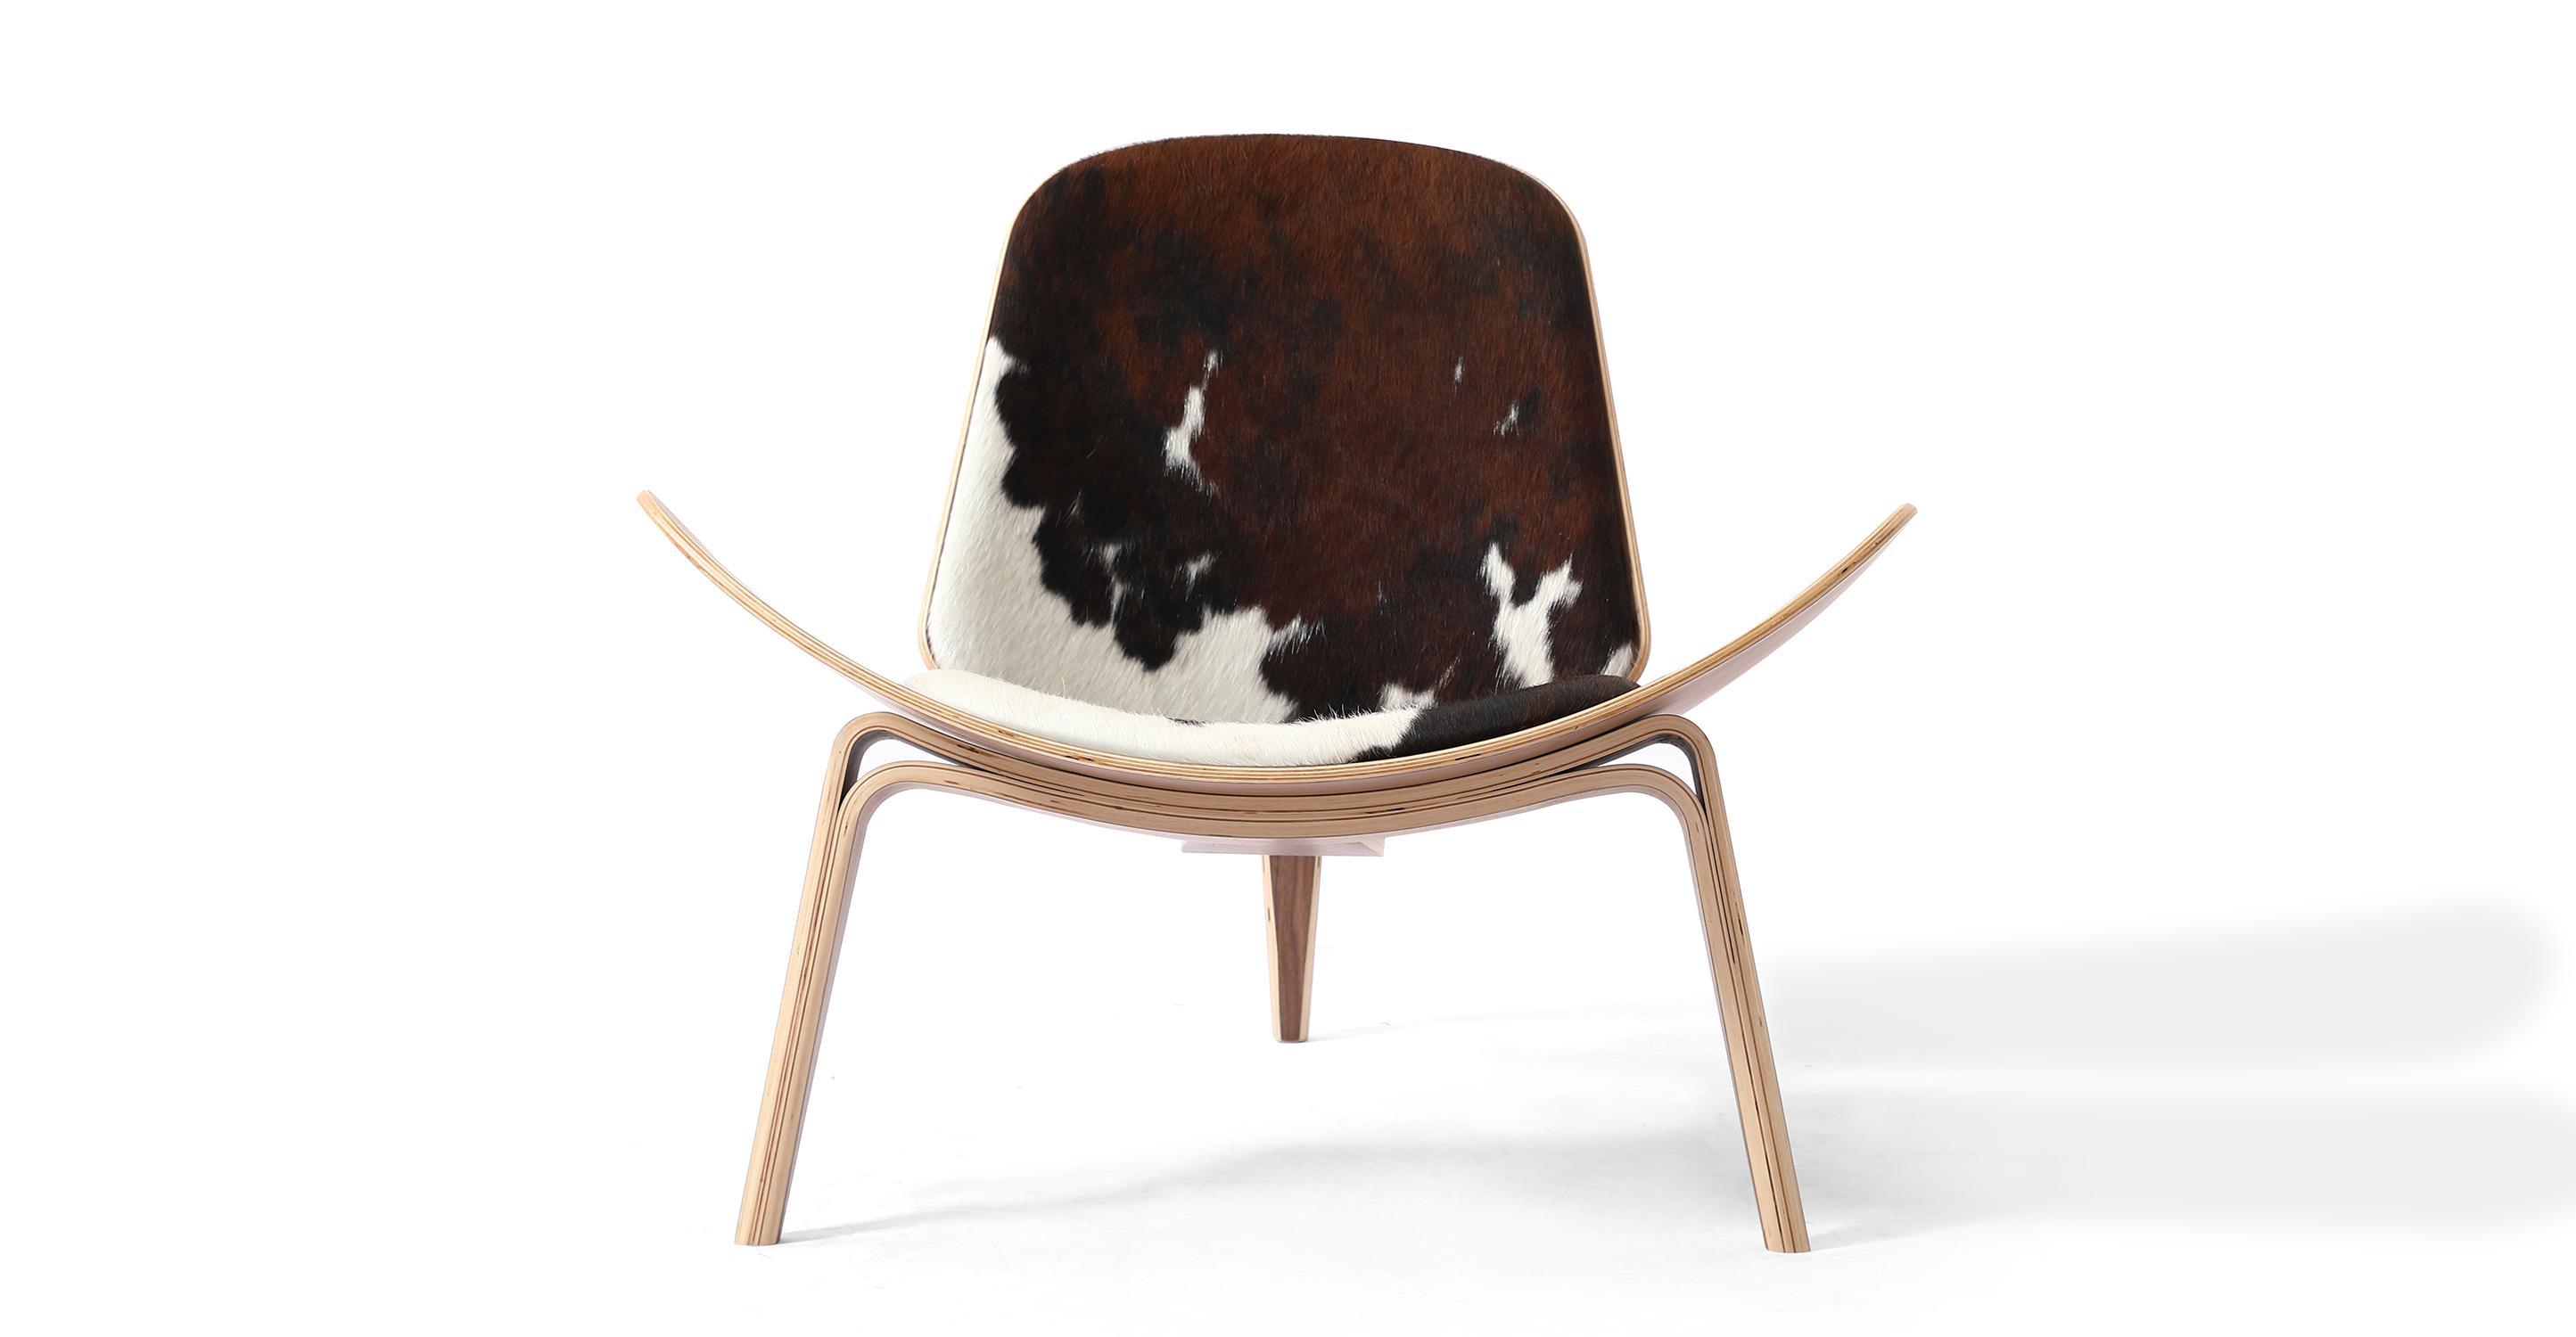 Tripod Leather Chair 2-pc Set, Walnut/Black, Brown & White Cowhide